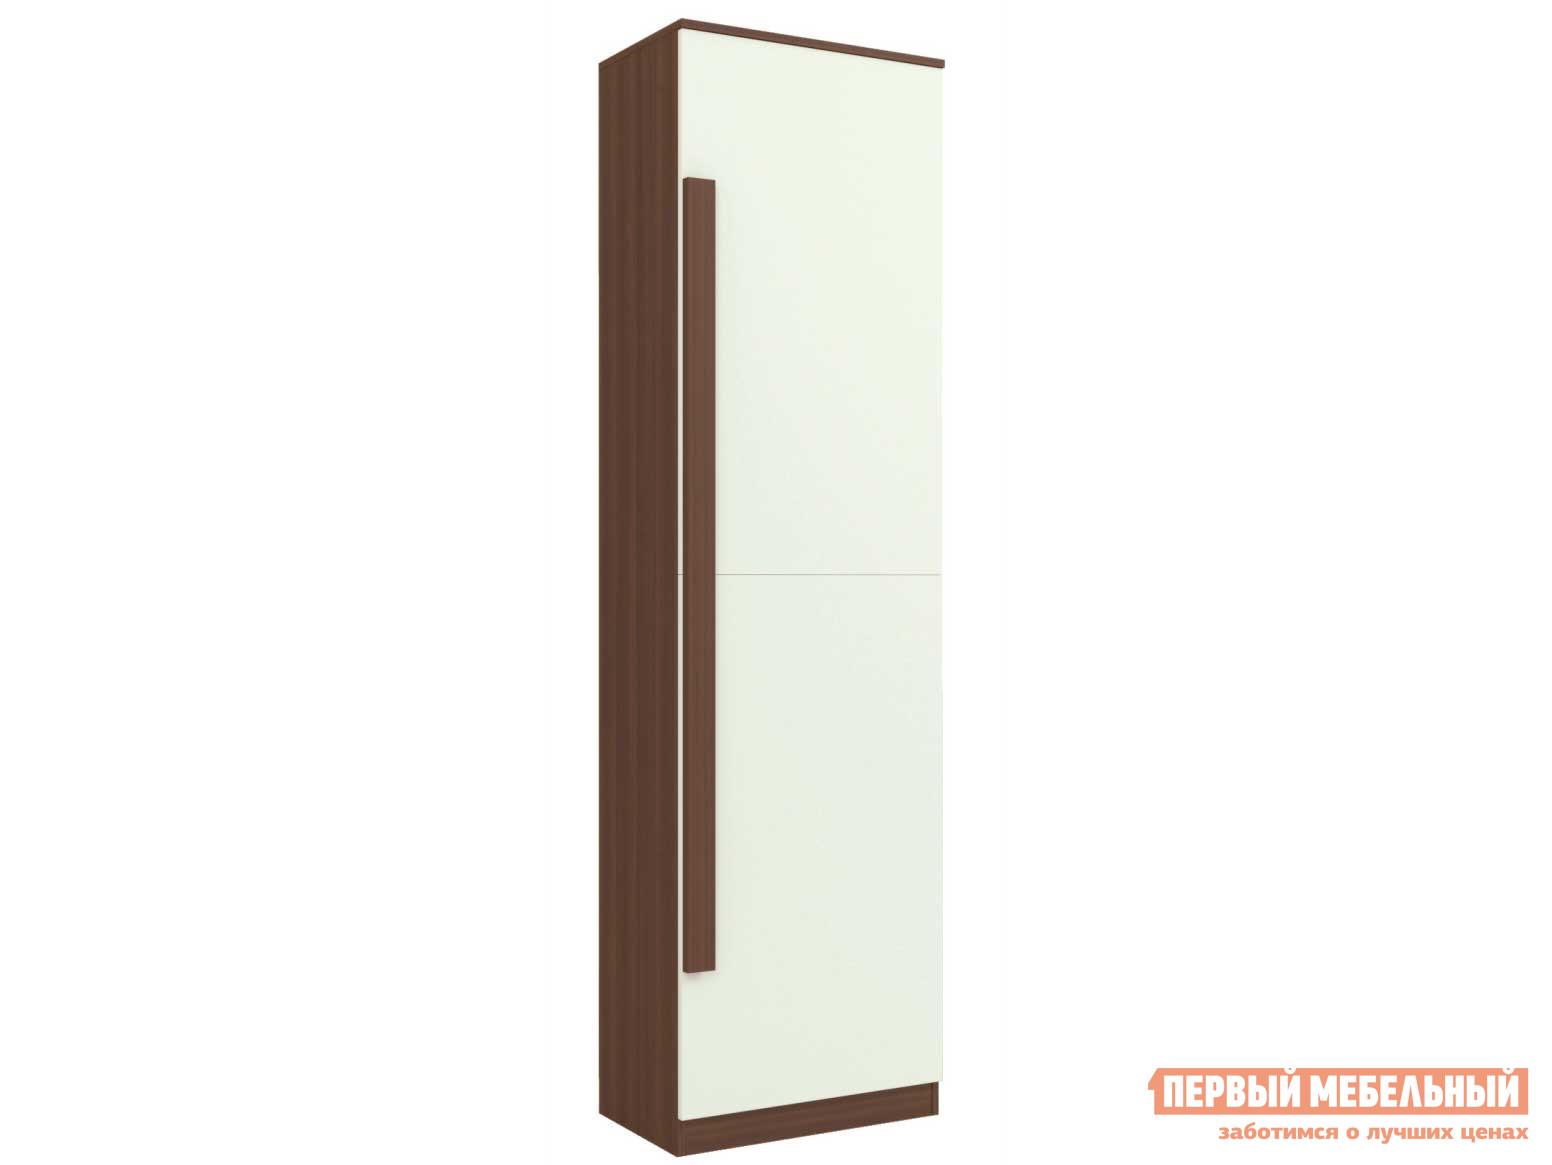 лучшая цена Шкаф распашной глянцевый ТД Арника Мод. ЛК9 Шкаф для одежды